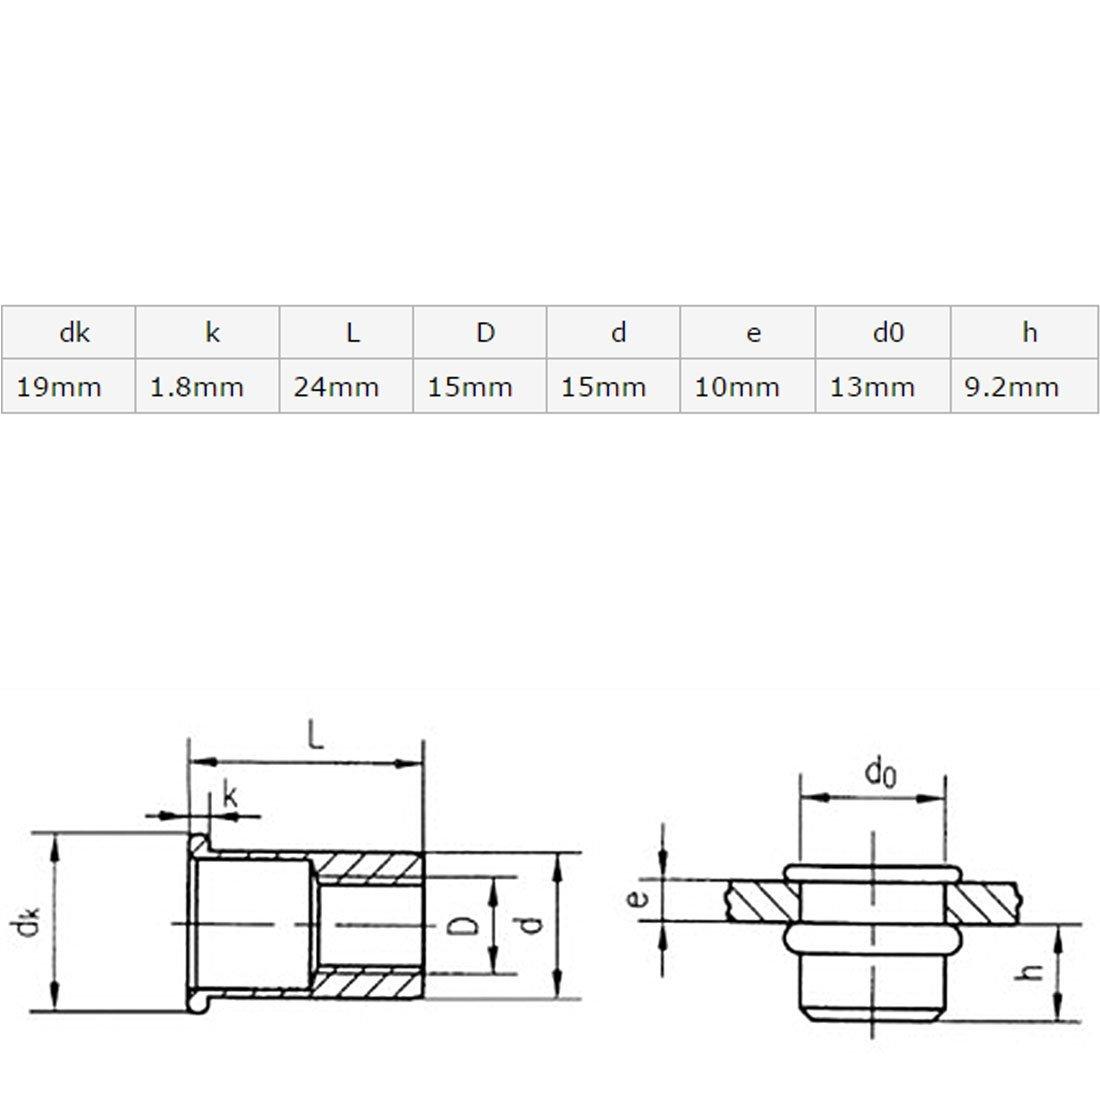 eDealMax a16041900ux0261 M12 in Acciaio INOX a Testa piatta Rivet Dado Inserisci